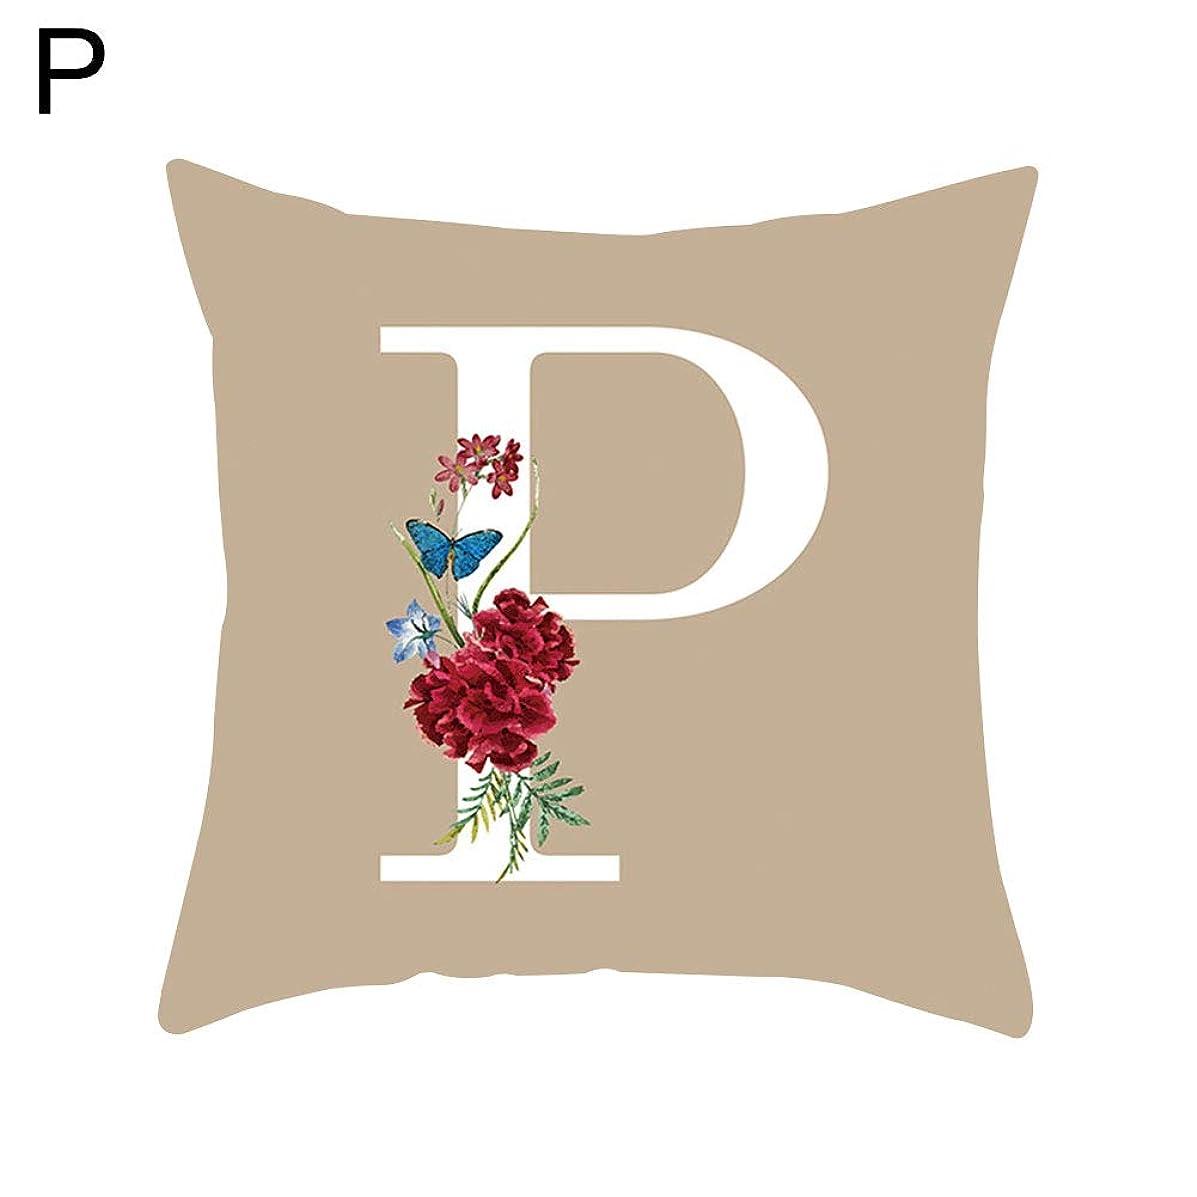 millet16zjh A-Z Capital Letter Flower Pillow Case Home Decor Sofa Waist Throw Cushion Cover - P